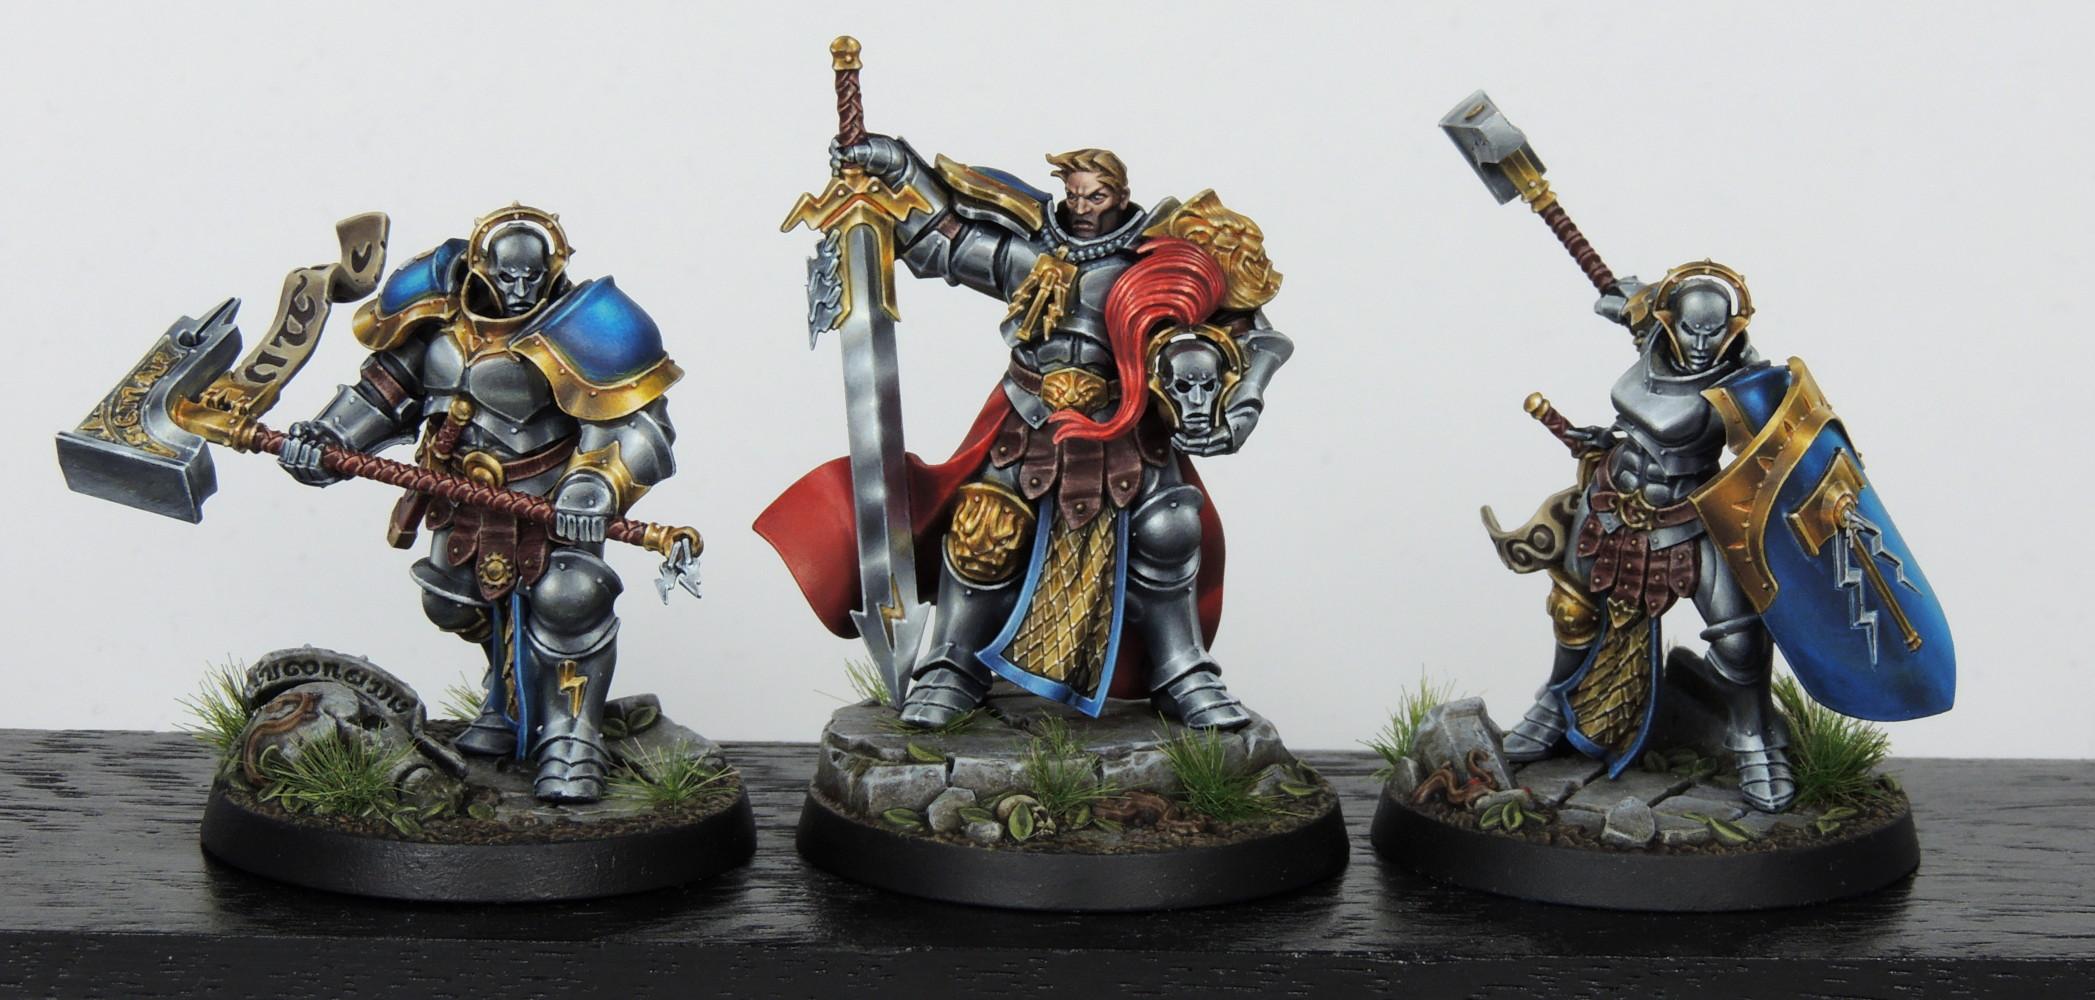 Steelheart's Champions